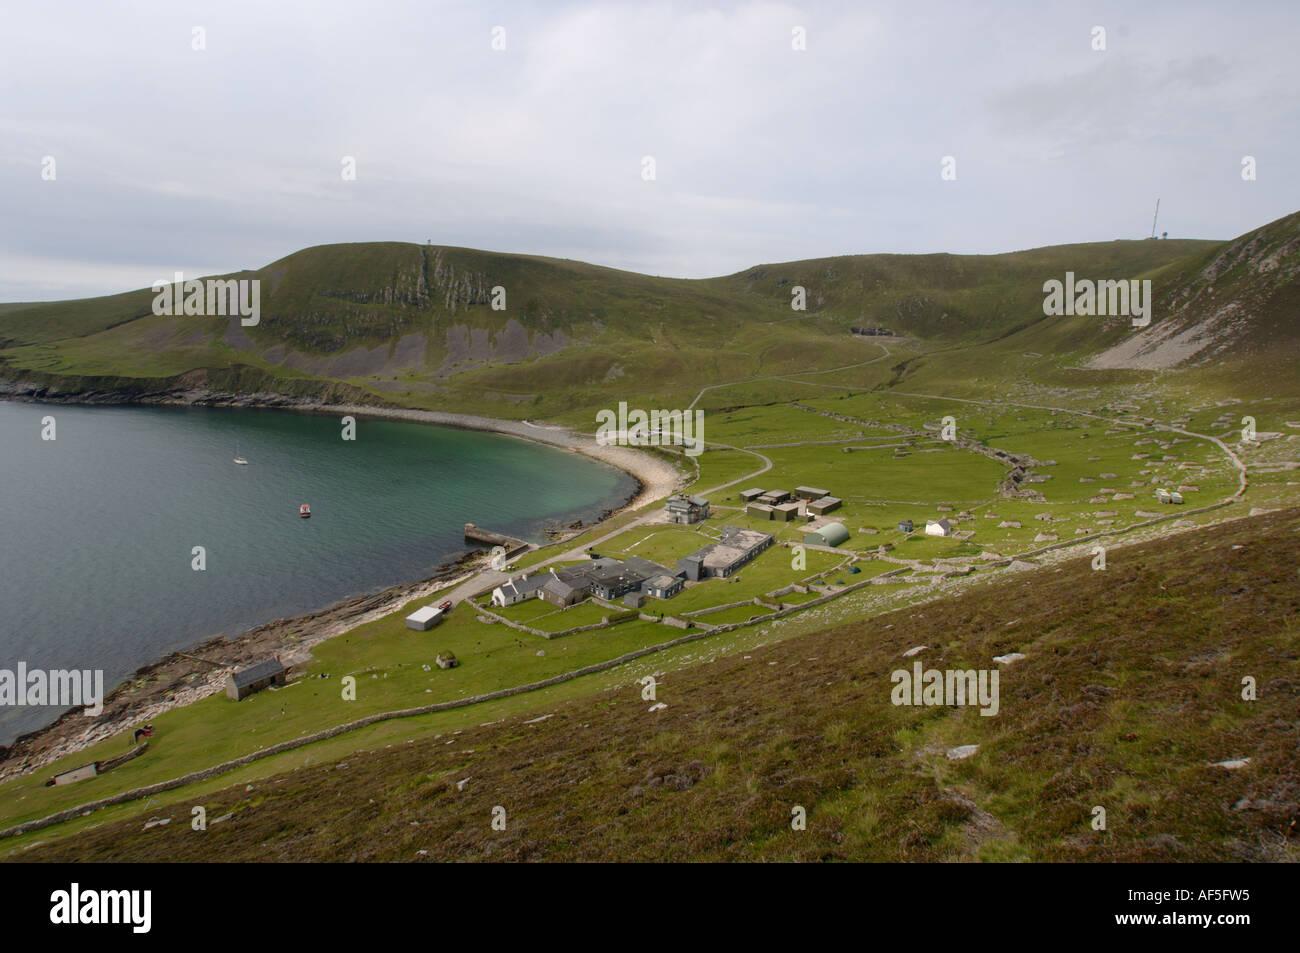 Village Bay. Saint Kilda Island Western Islands Outer Herbrides Scotland - Stock Image